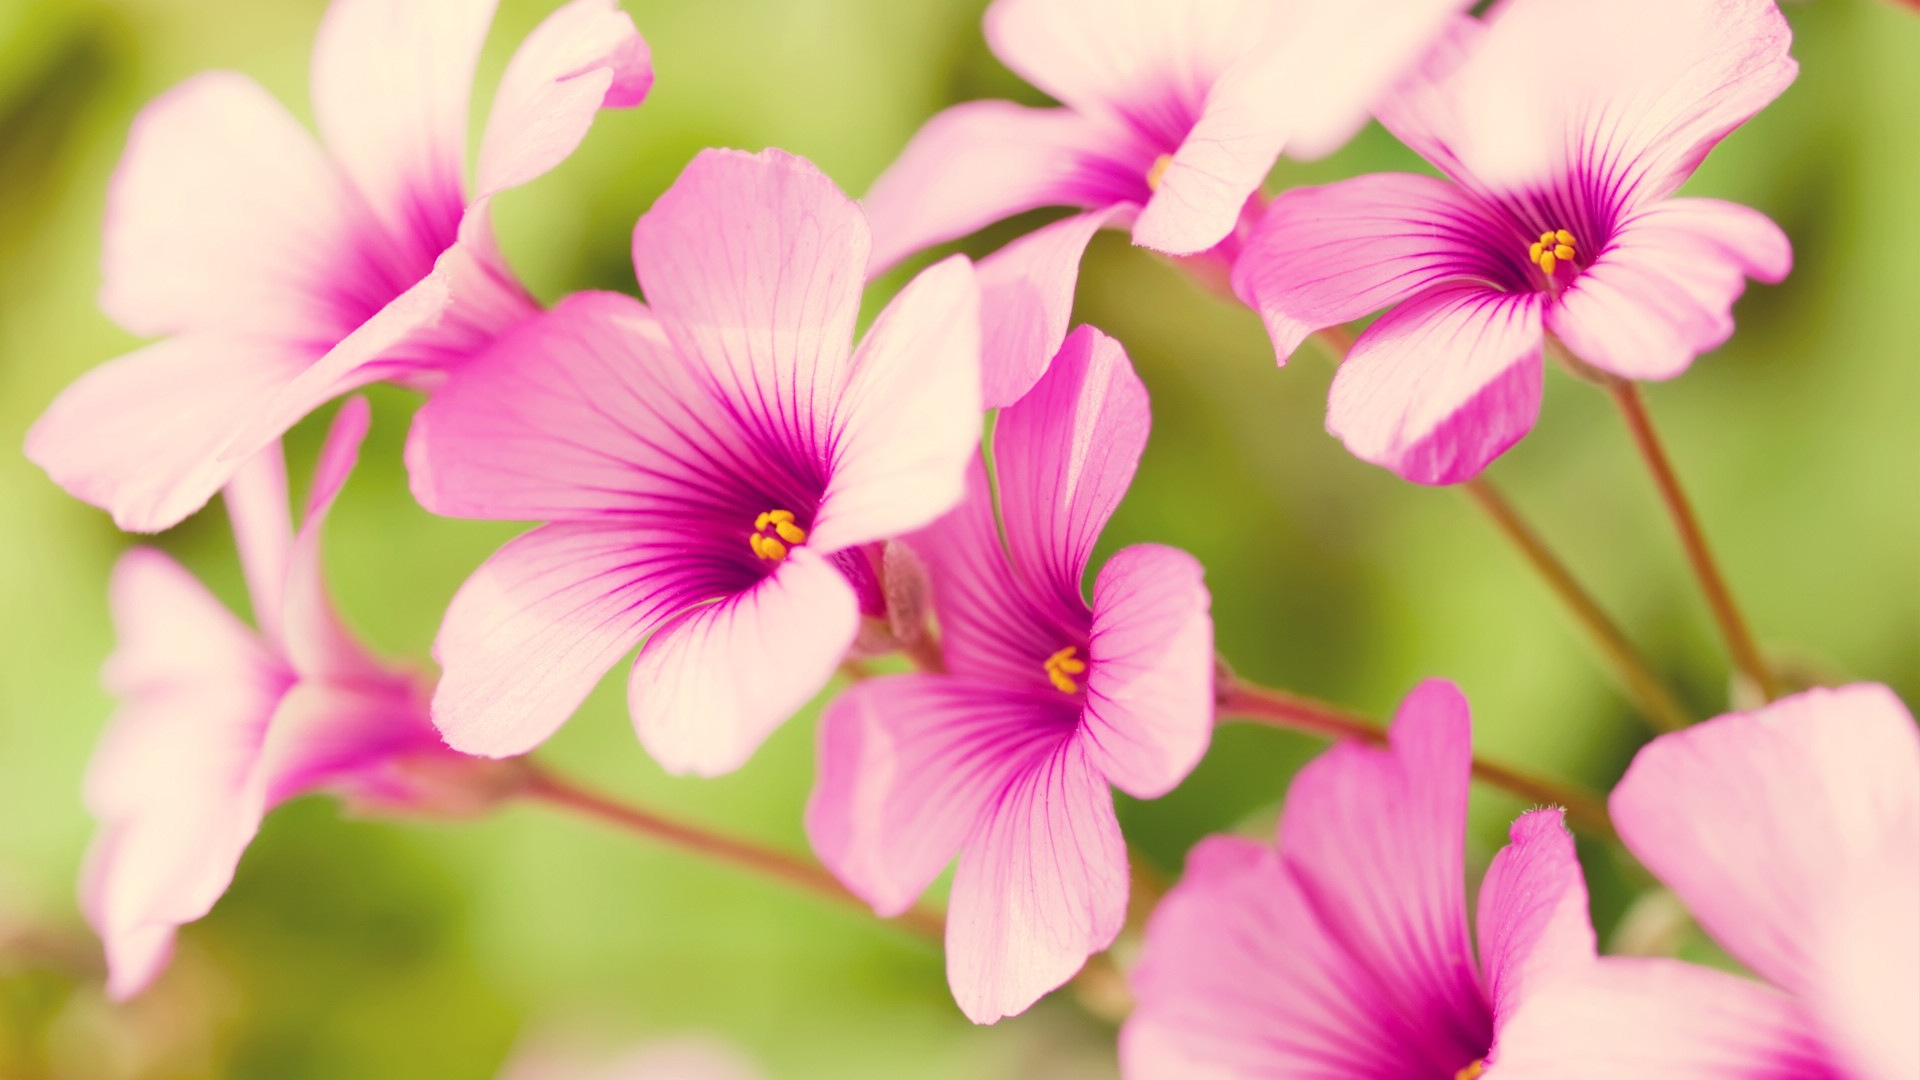 spring flowers 1920x1080